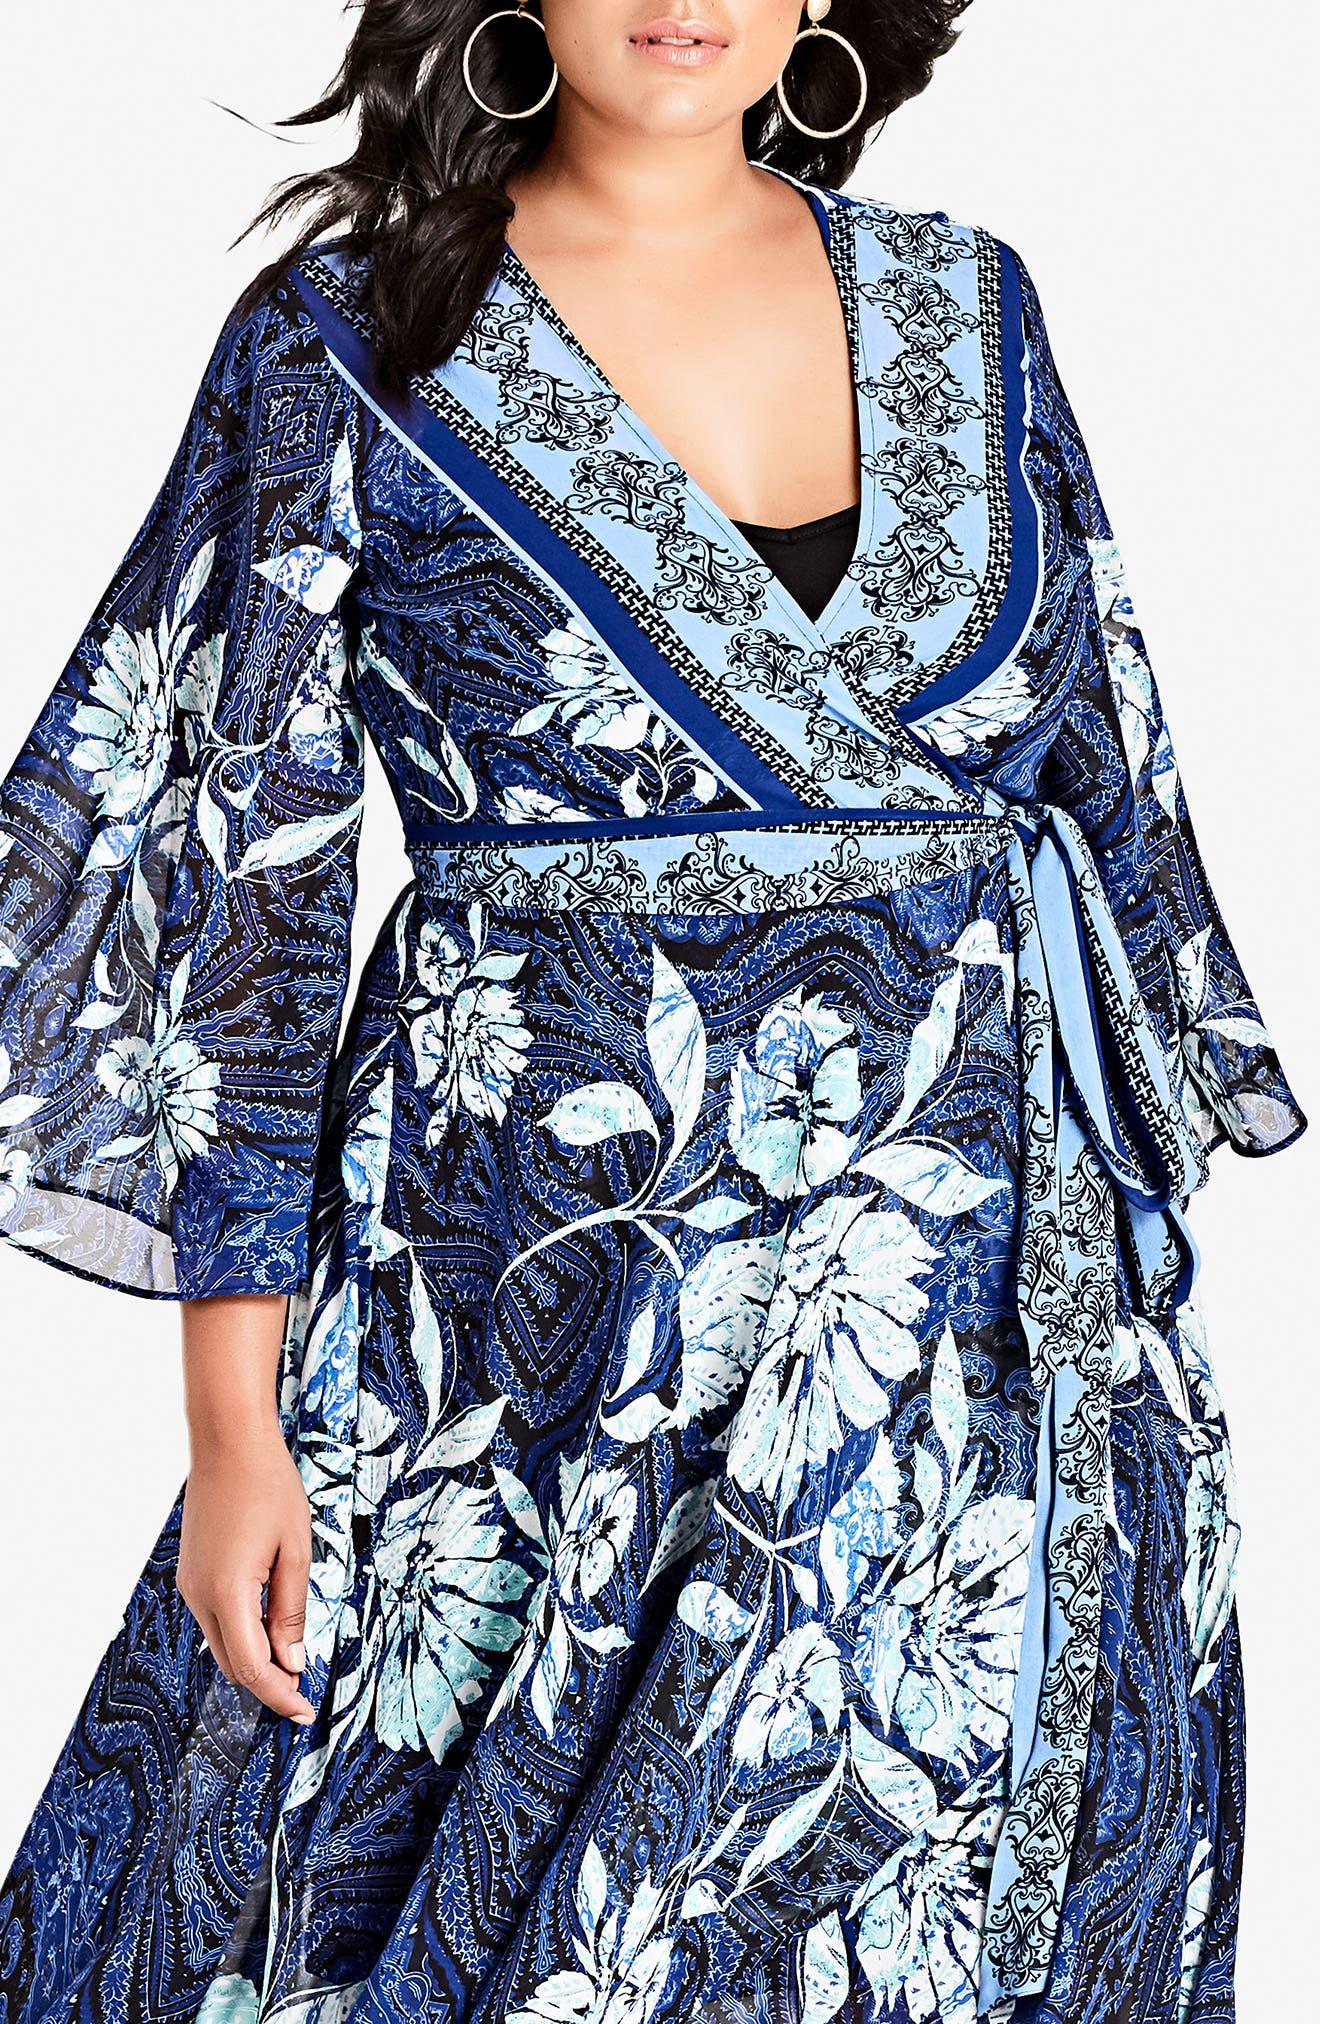 Blue Illusion High/Low Wrap Dress,                             Alternate thumbnail 3, color,                             BLUE ILLUSION